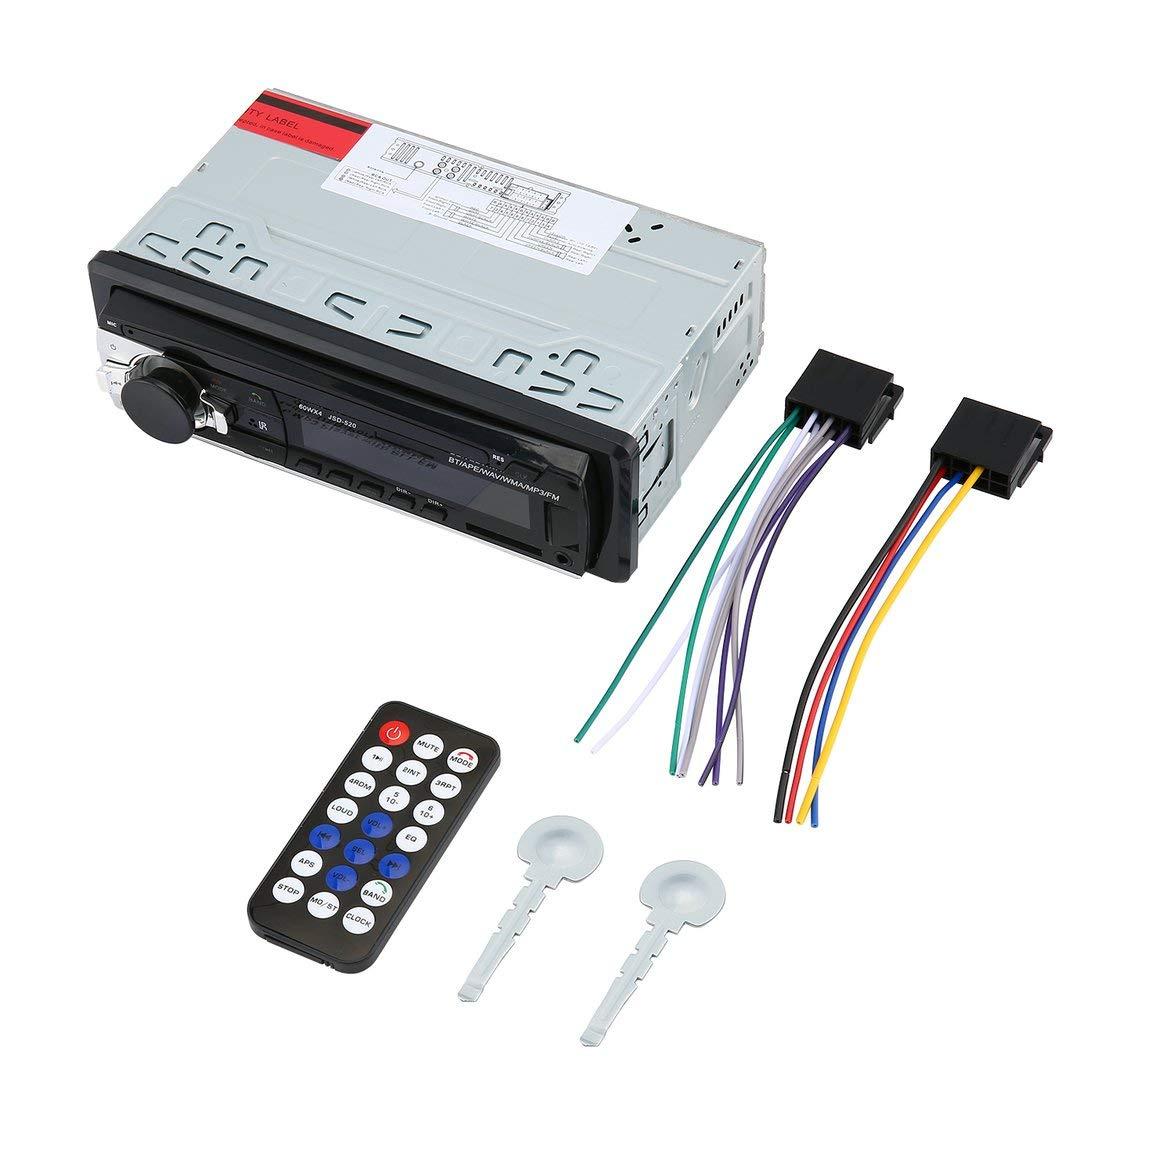 MqbY Car MP3 Player AUX Audio Input LOC Loud EQ 4-Way RCA Output